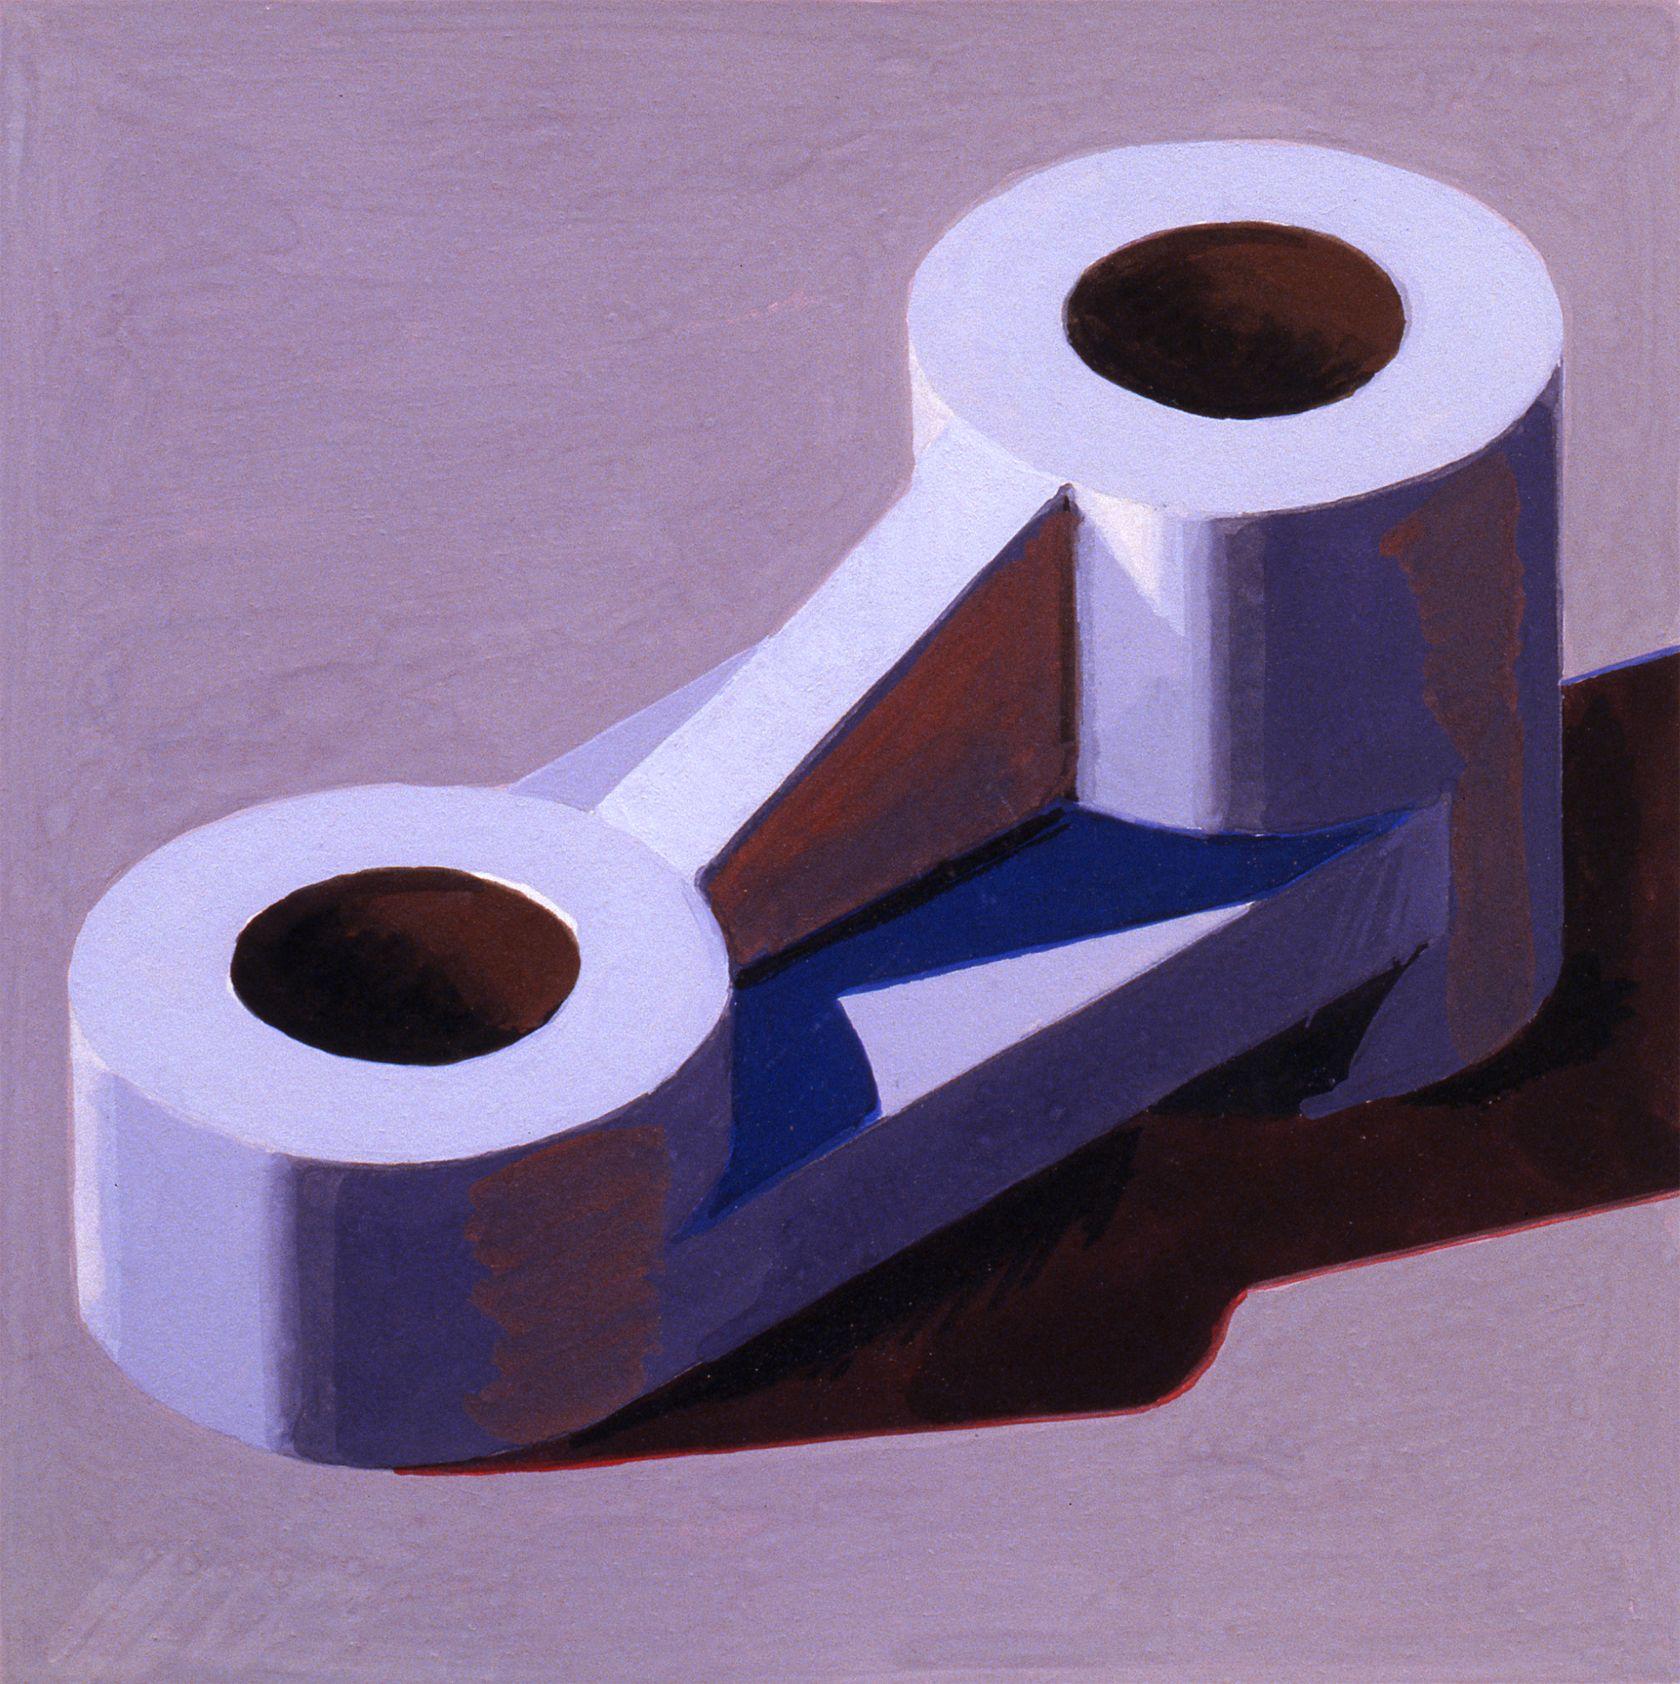 Robert Cottingham, Component XXXIV, 2005, gouache on paper, 5 1/2 x 5 1/2 inches